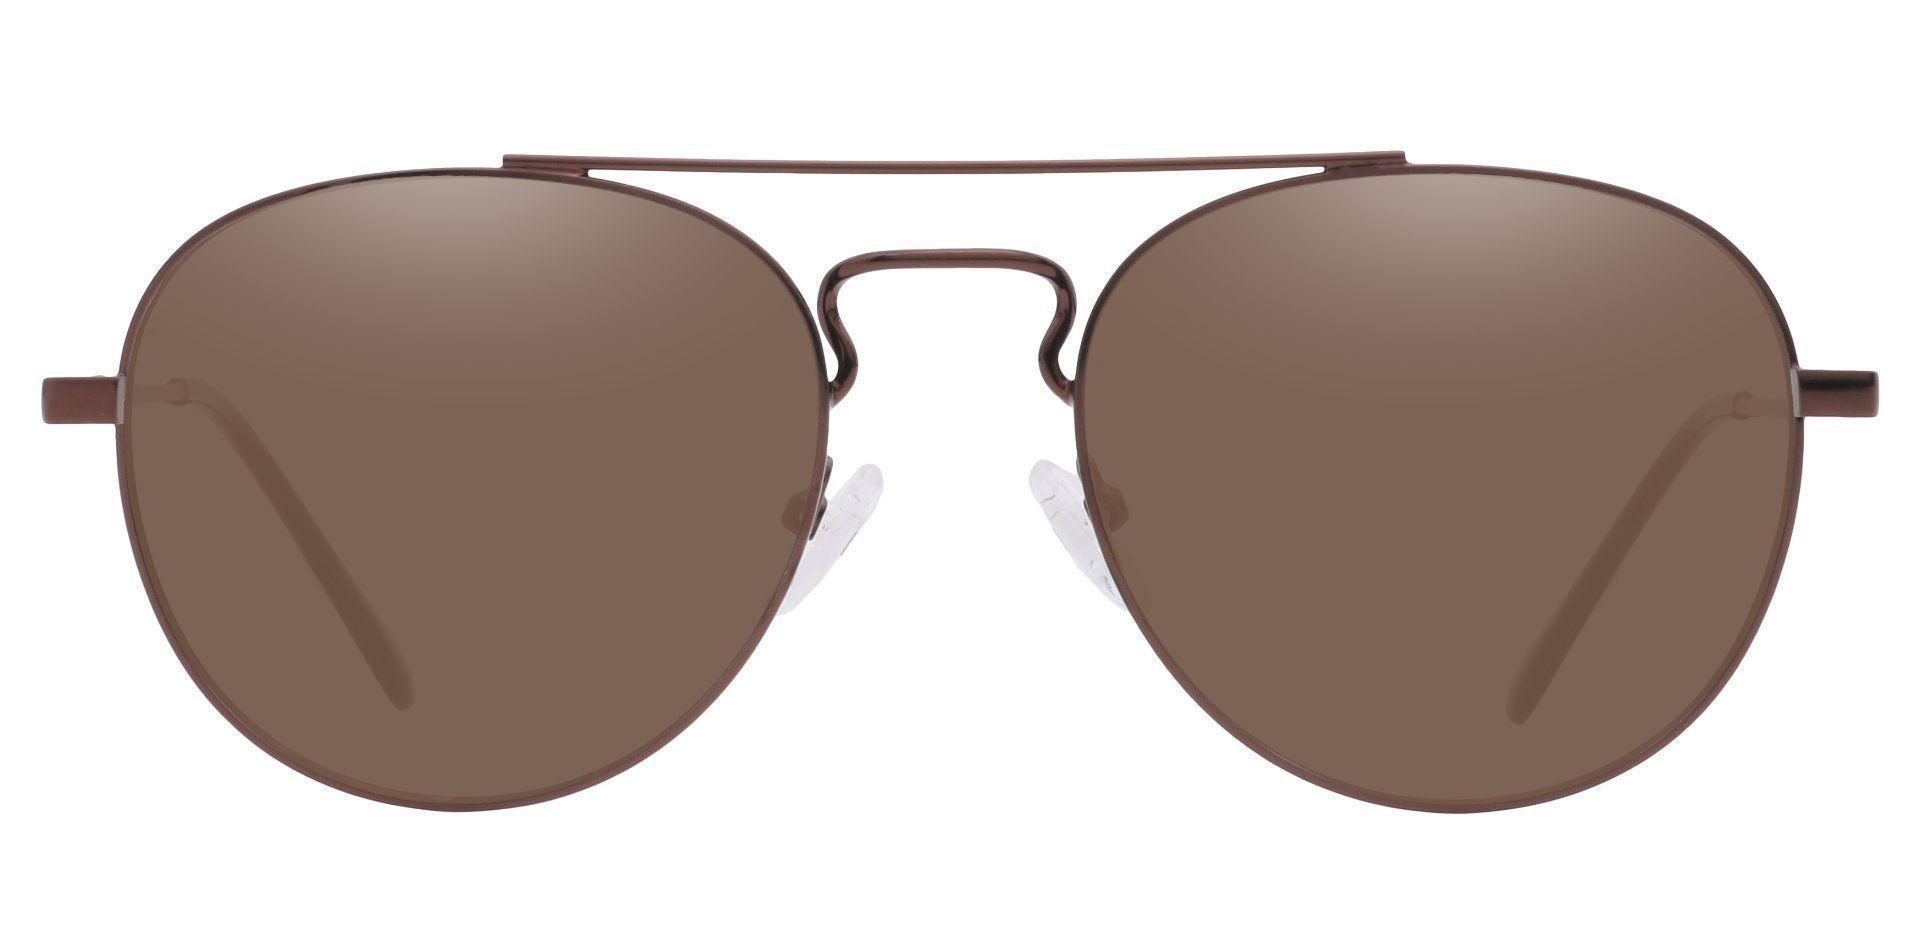 Trapp Aviator Progressive Sunglasses - Brown Frame With Brown Lenses